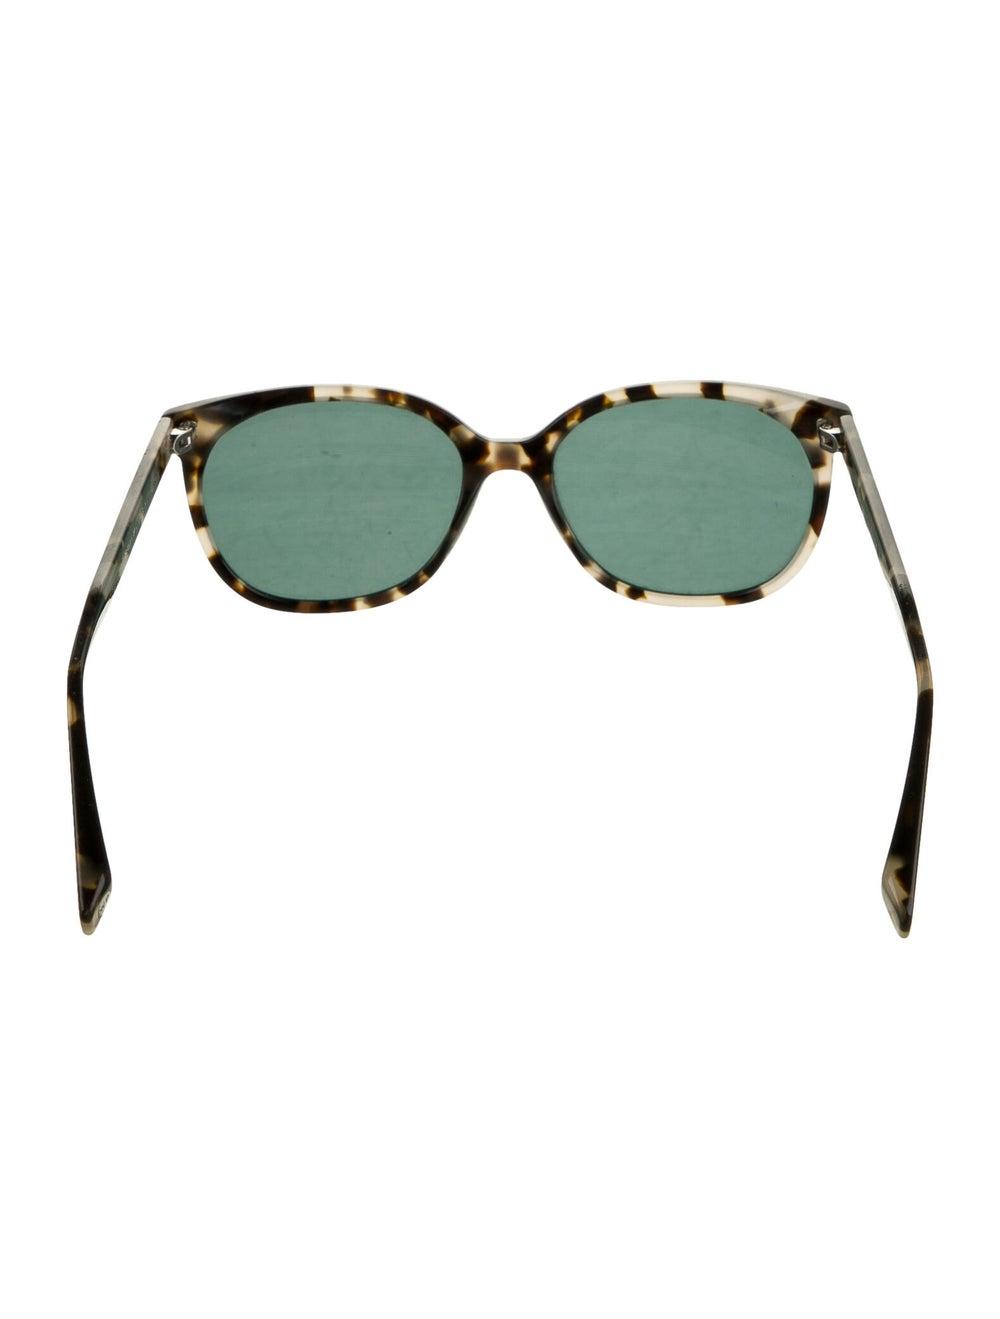 Warby Parker Tortoiseshell Wayfarer Sunglasses bl… - image 3